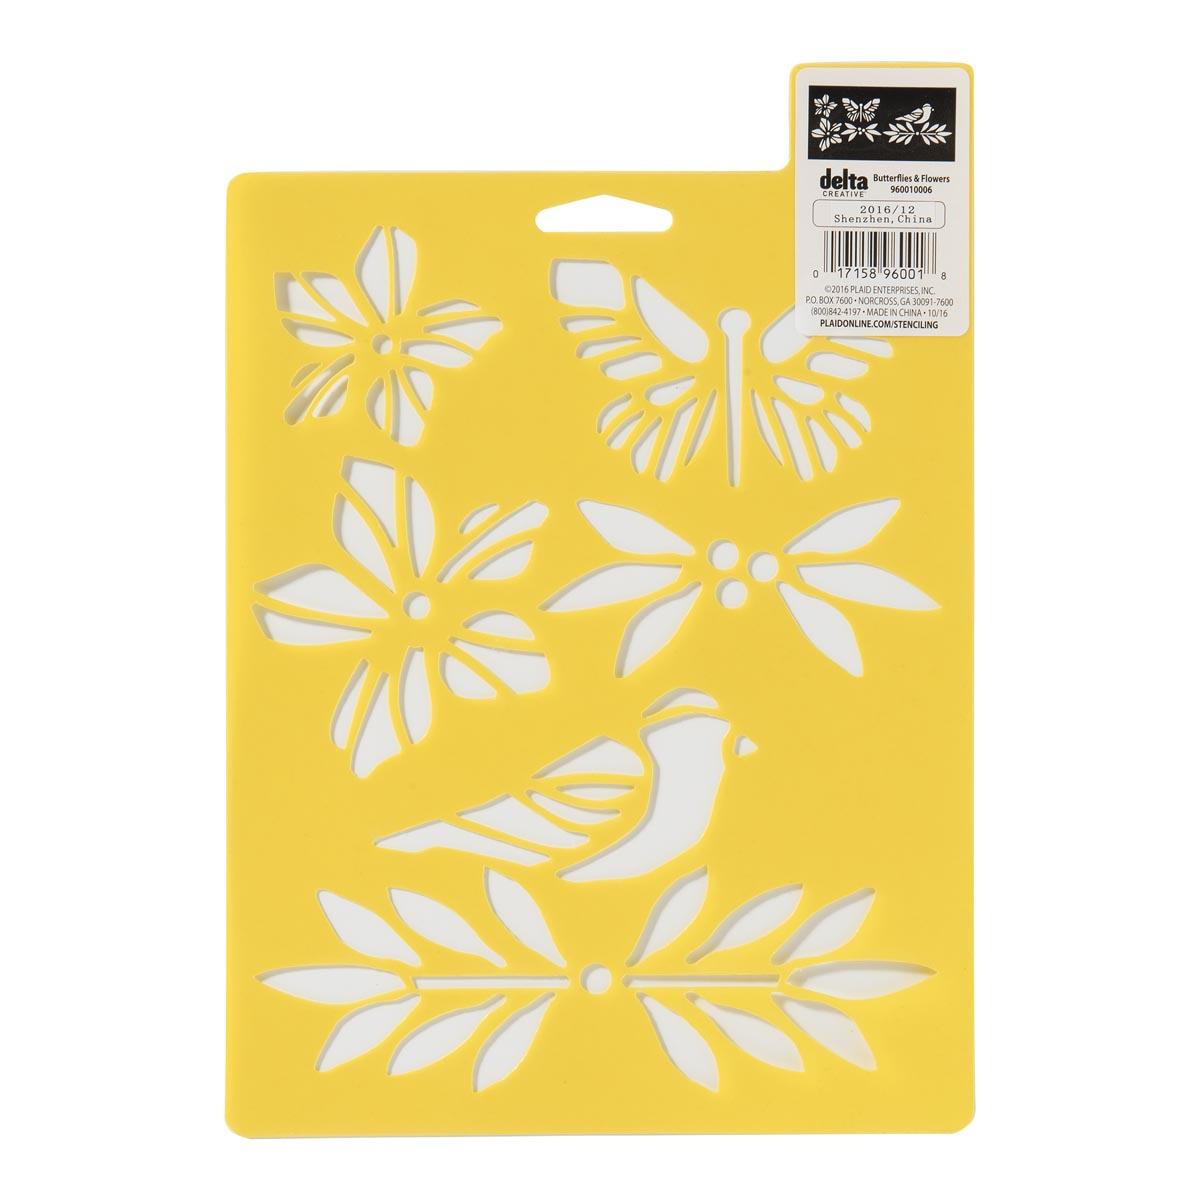 Delta Creative™ Stencil - Butterflies and Flowers